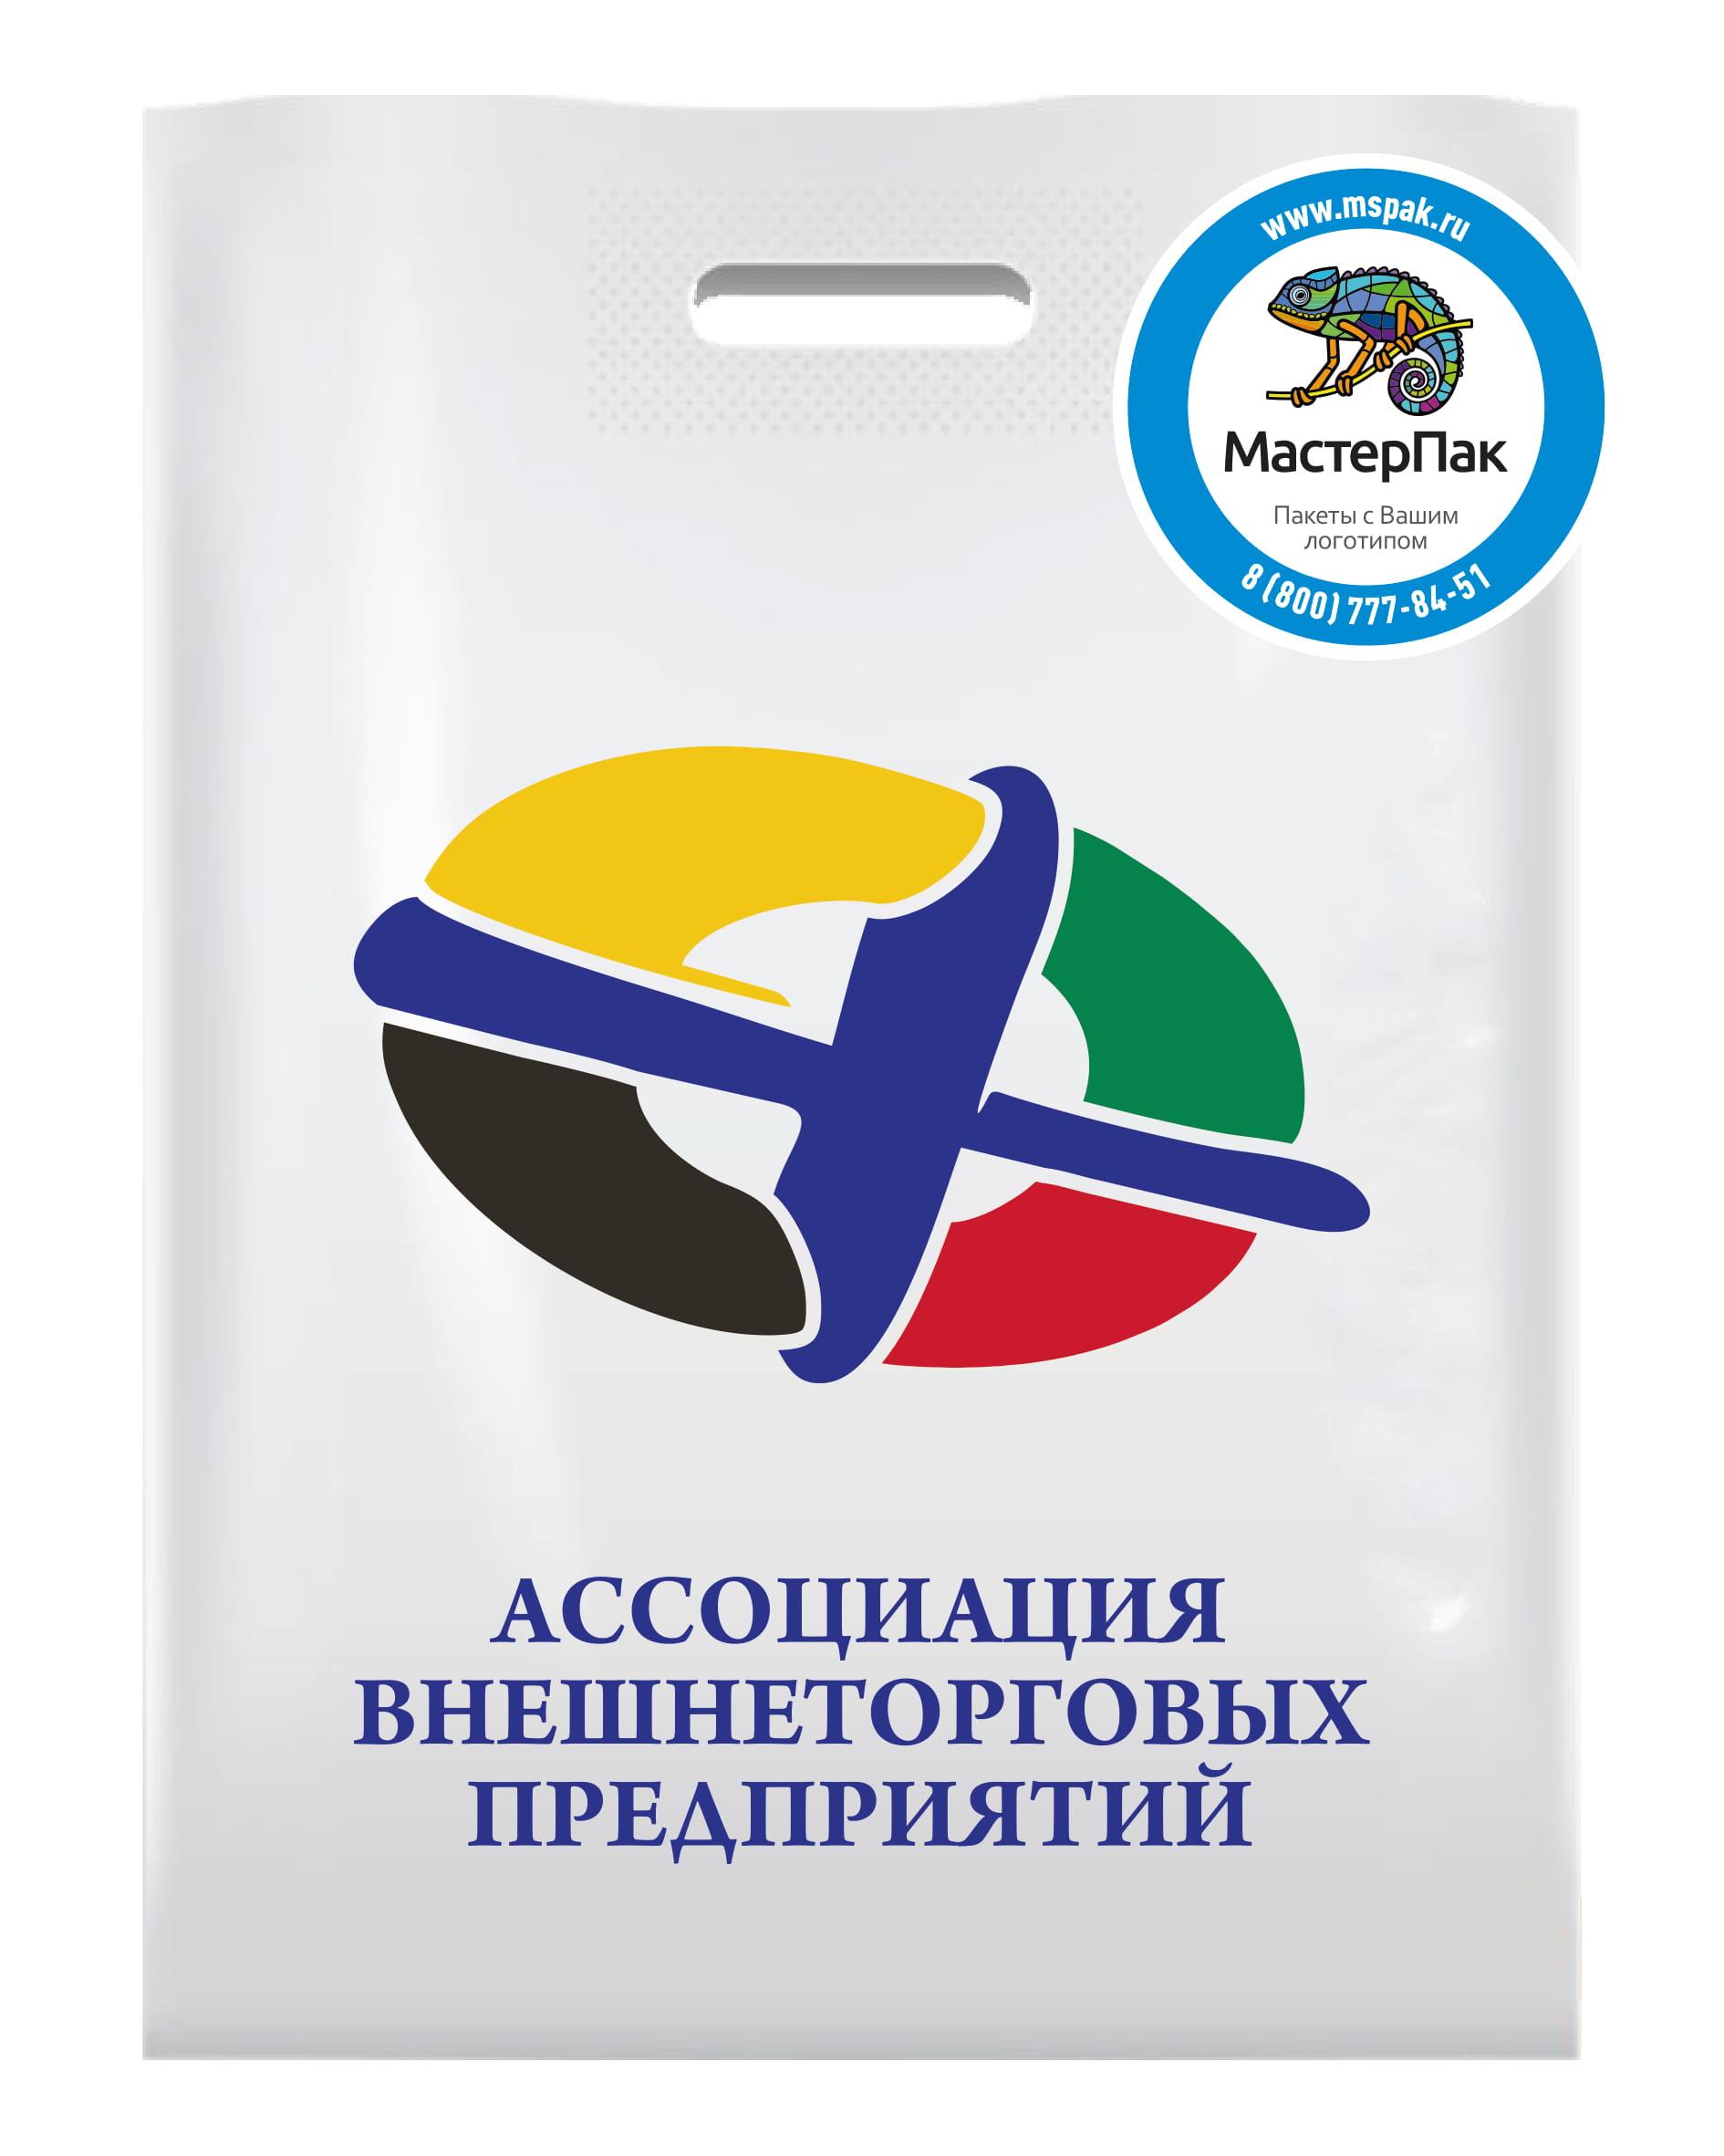 Пакет ПВД с логотипом Ассоциация внешнеторговых предприятий, Москва, 70 мкм, 30*40